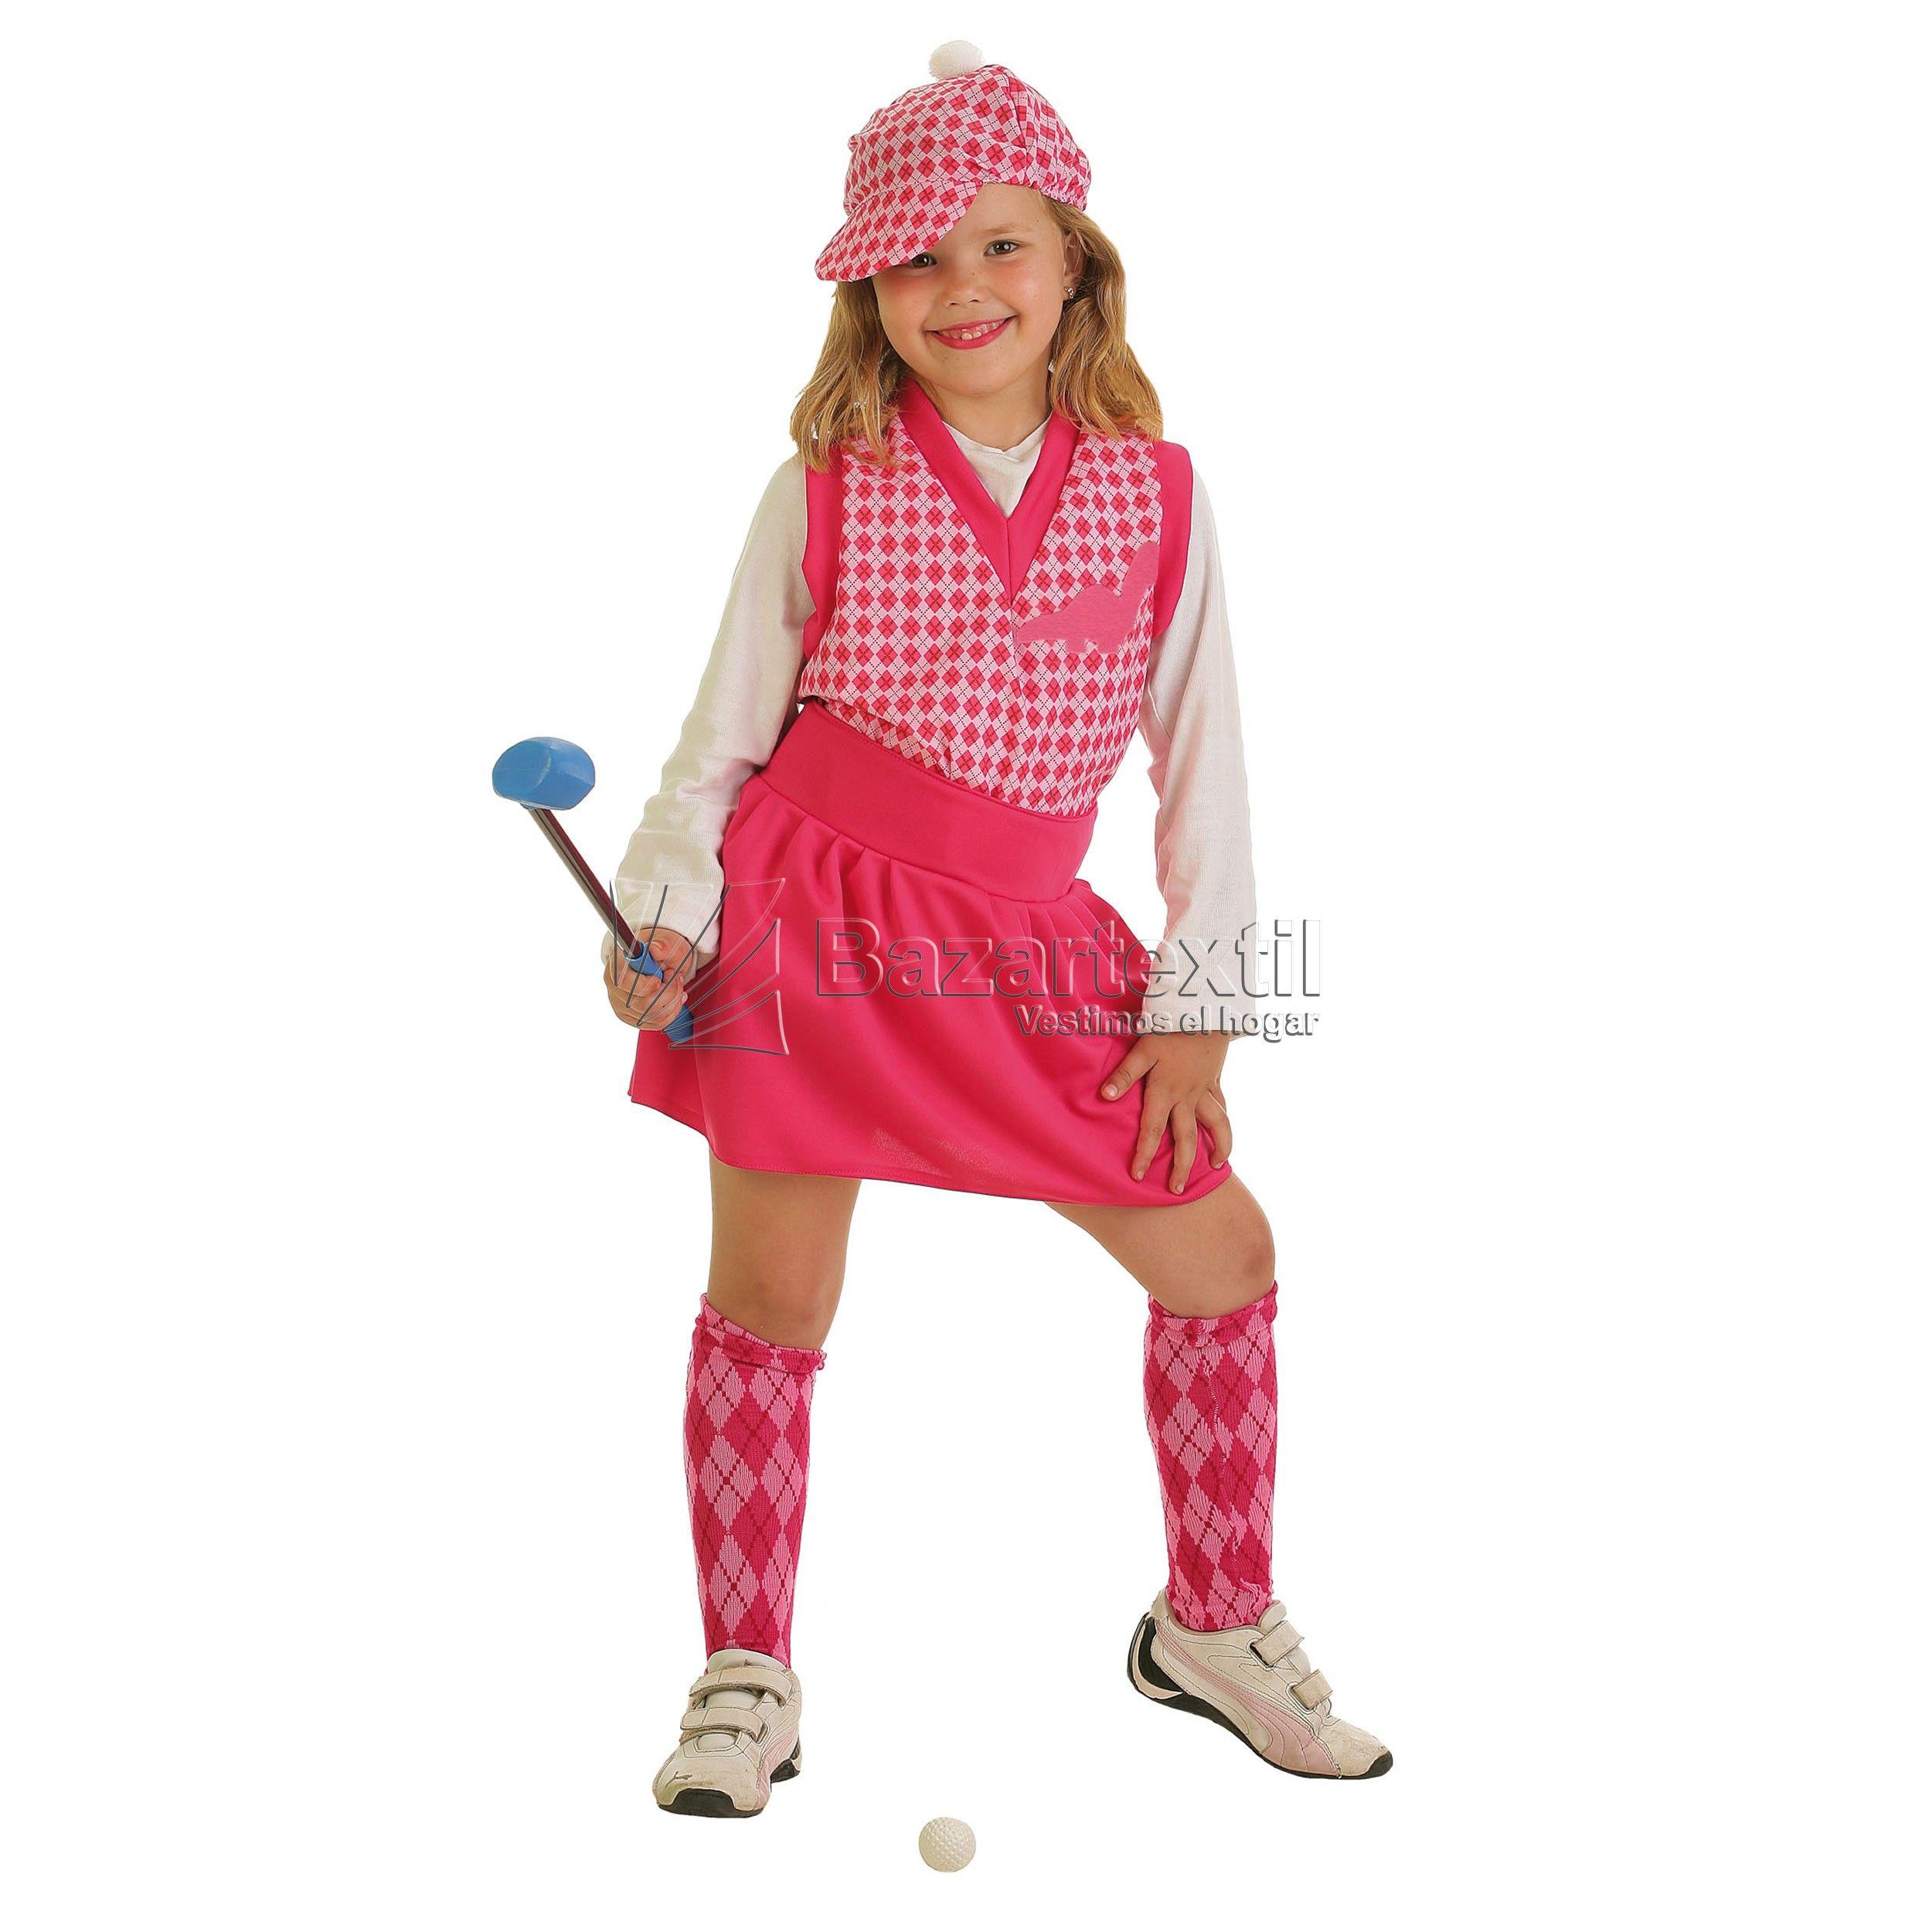 508abbd2c Disfraz Jugadora de Golf | disfraces | Golf